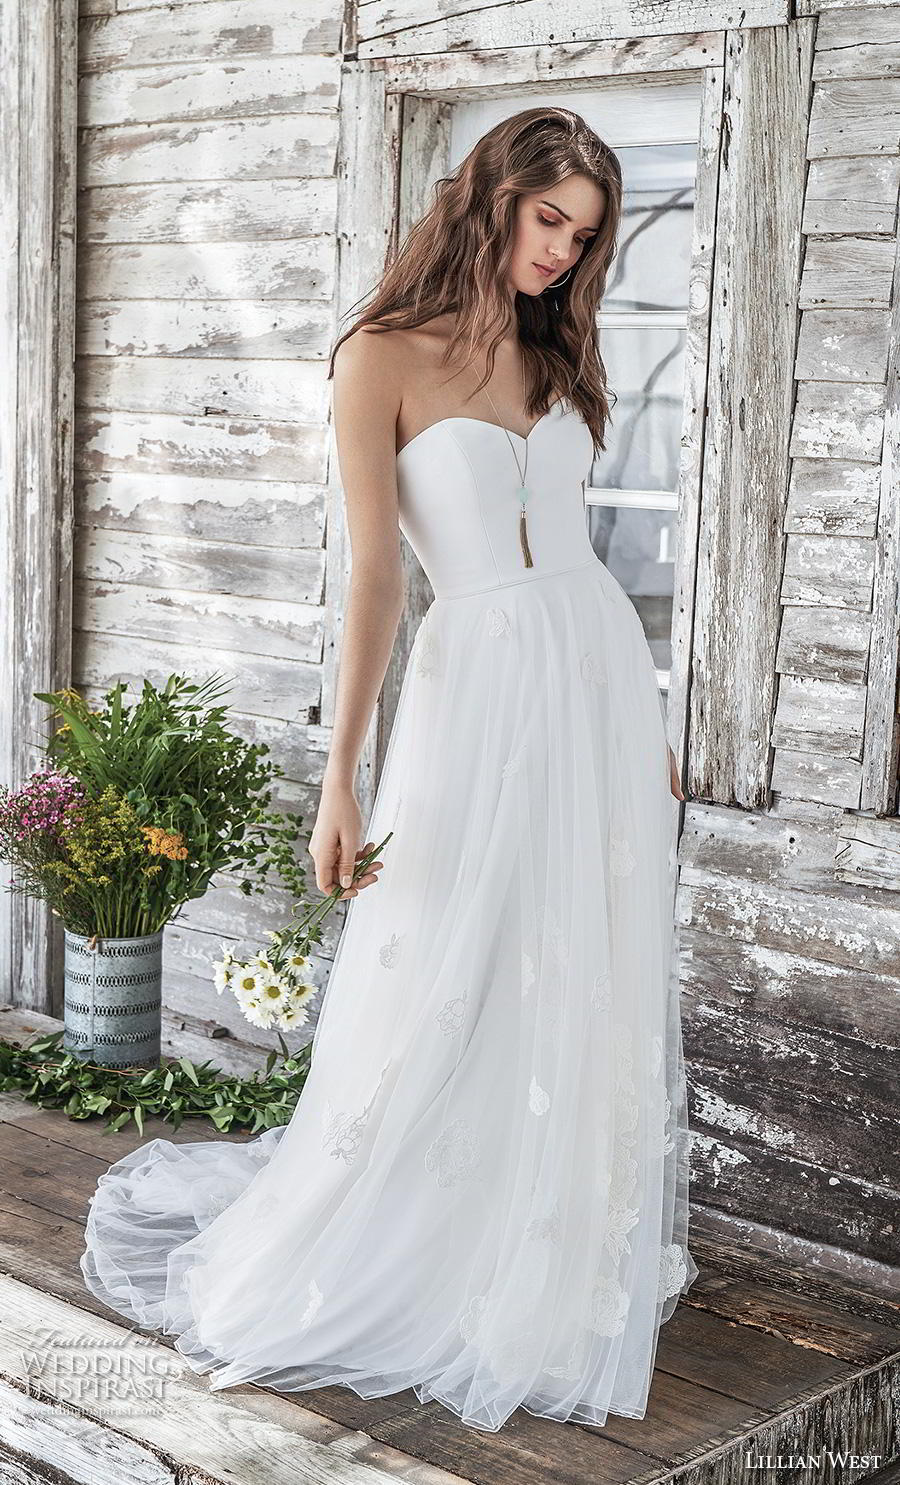 lillian west spring 2019 bridal strapless sweetheart neckline tulle skirt simple classic romantic a  line wedding dress mid back chapel train (9) mv